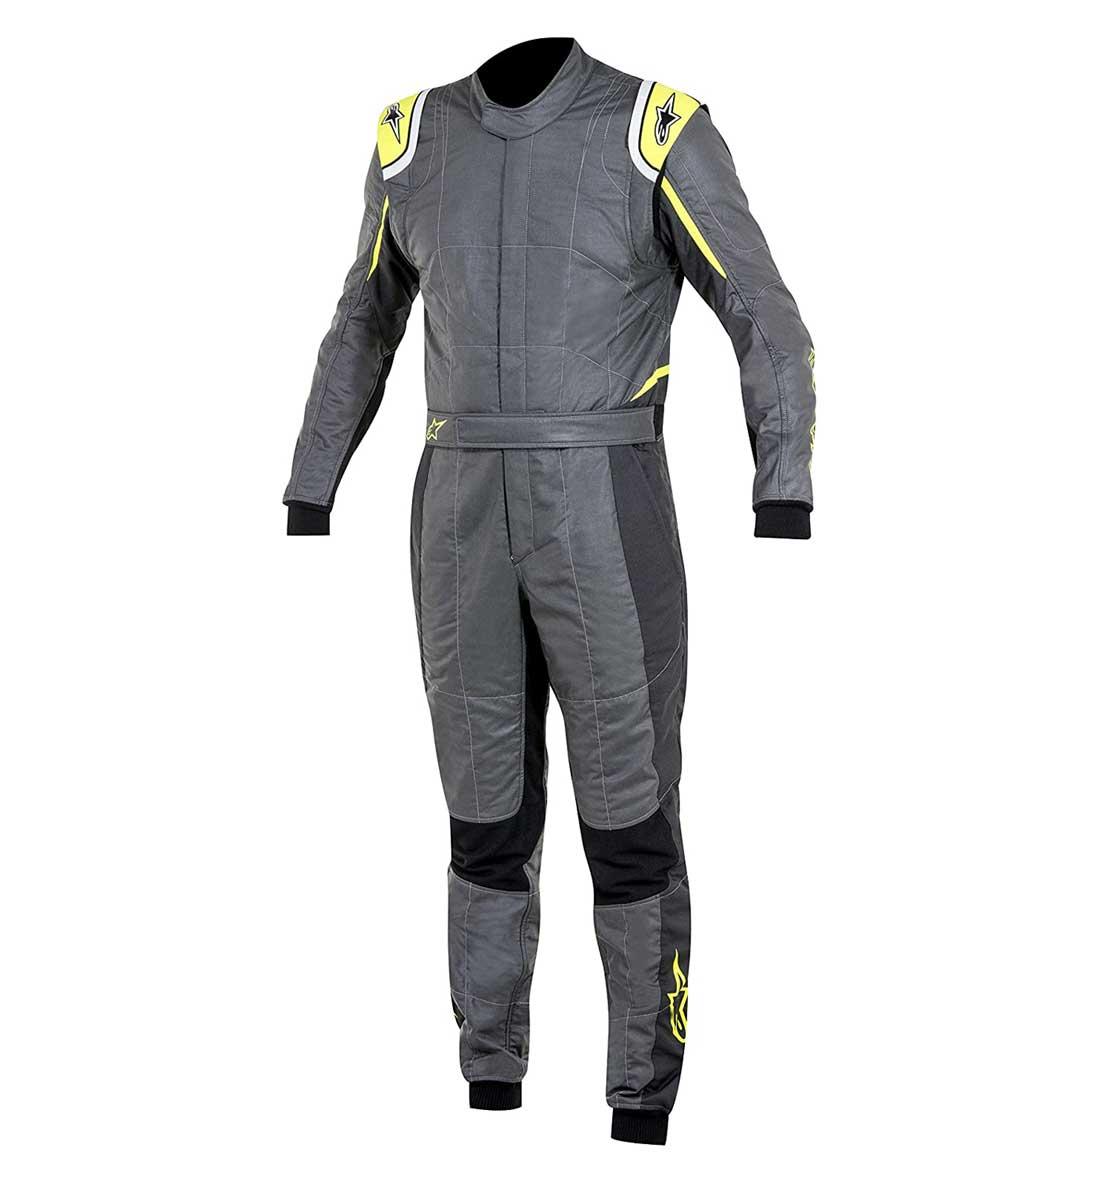 Alpinestars GP Tech Race Suit - Anthracite/Black/Yellow